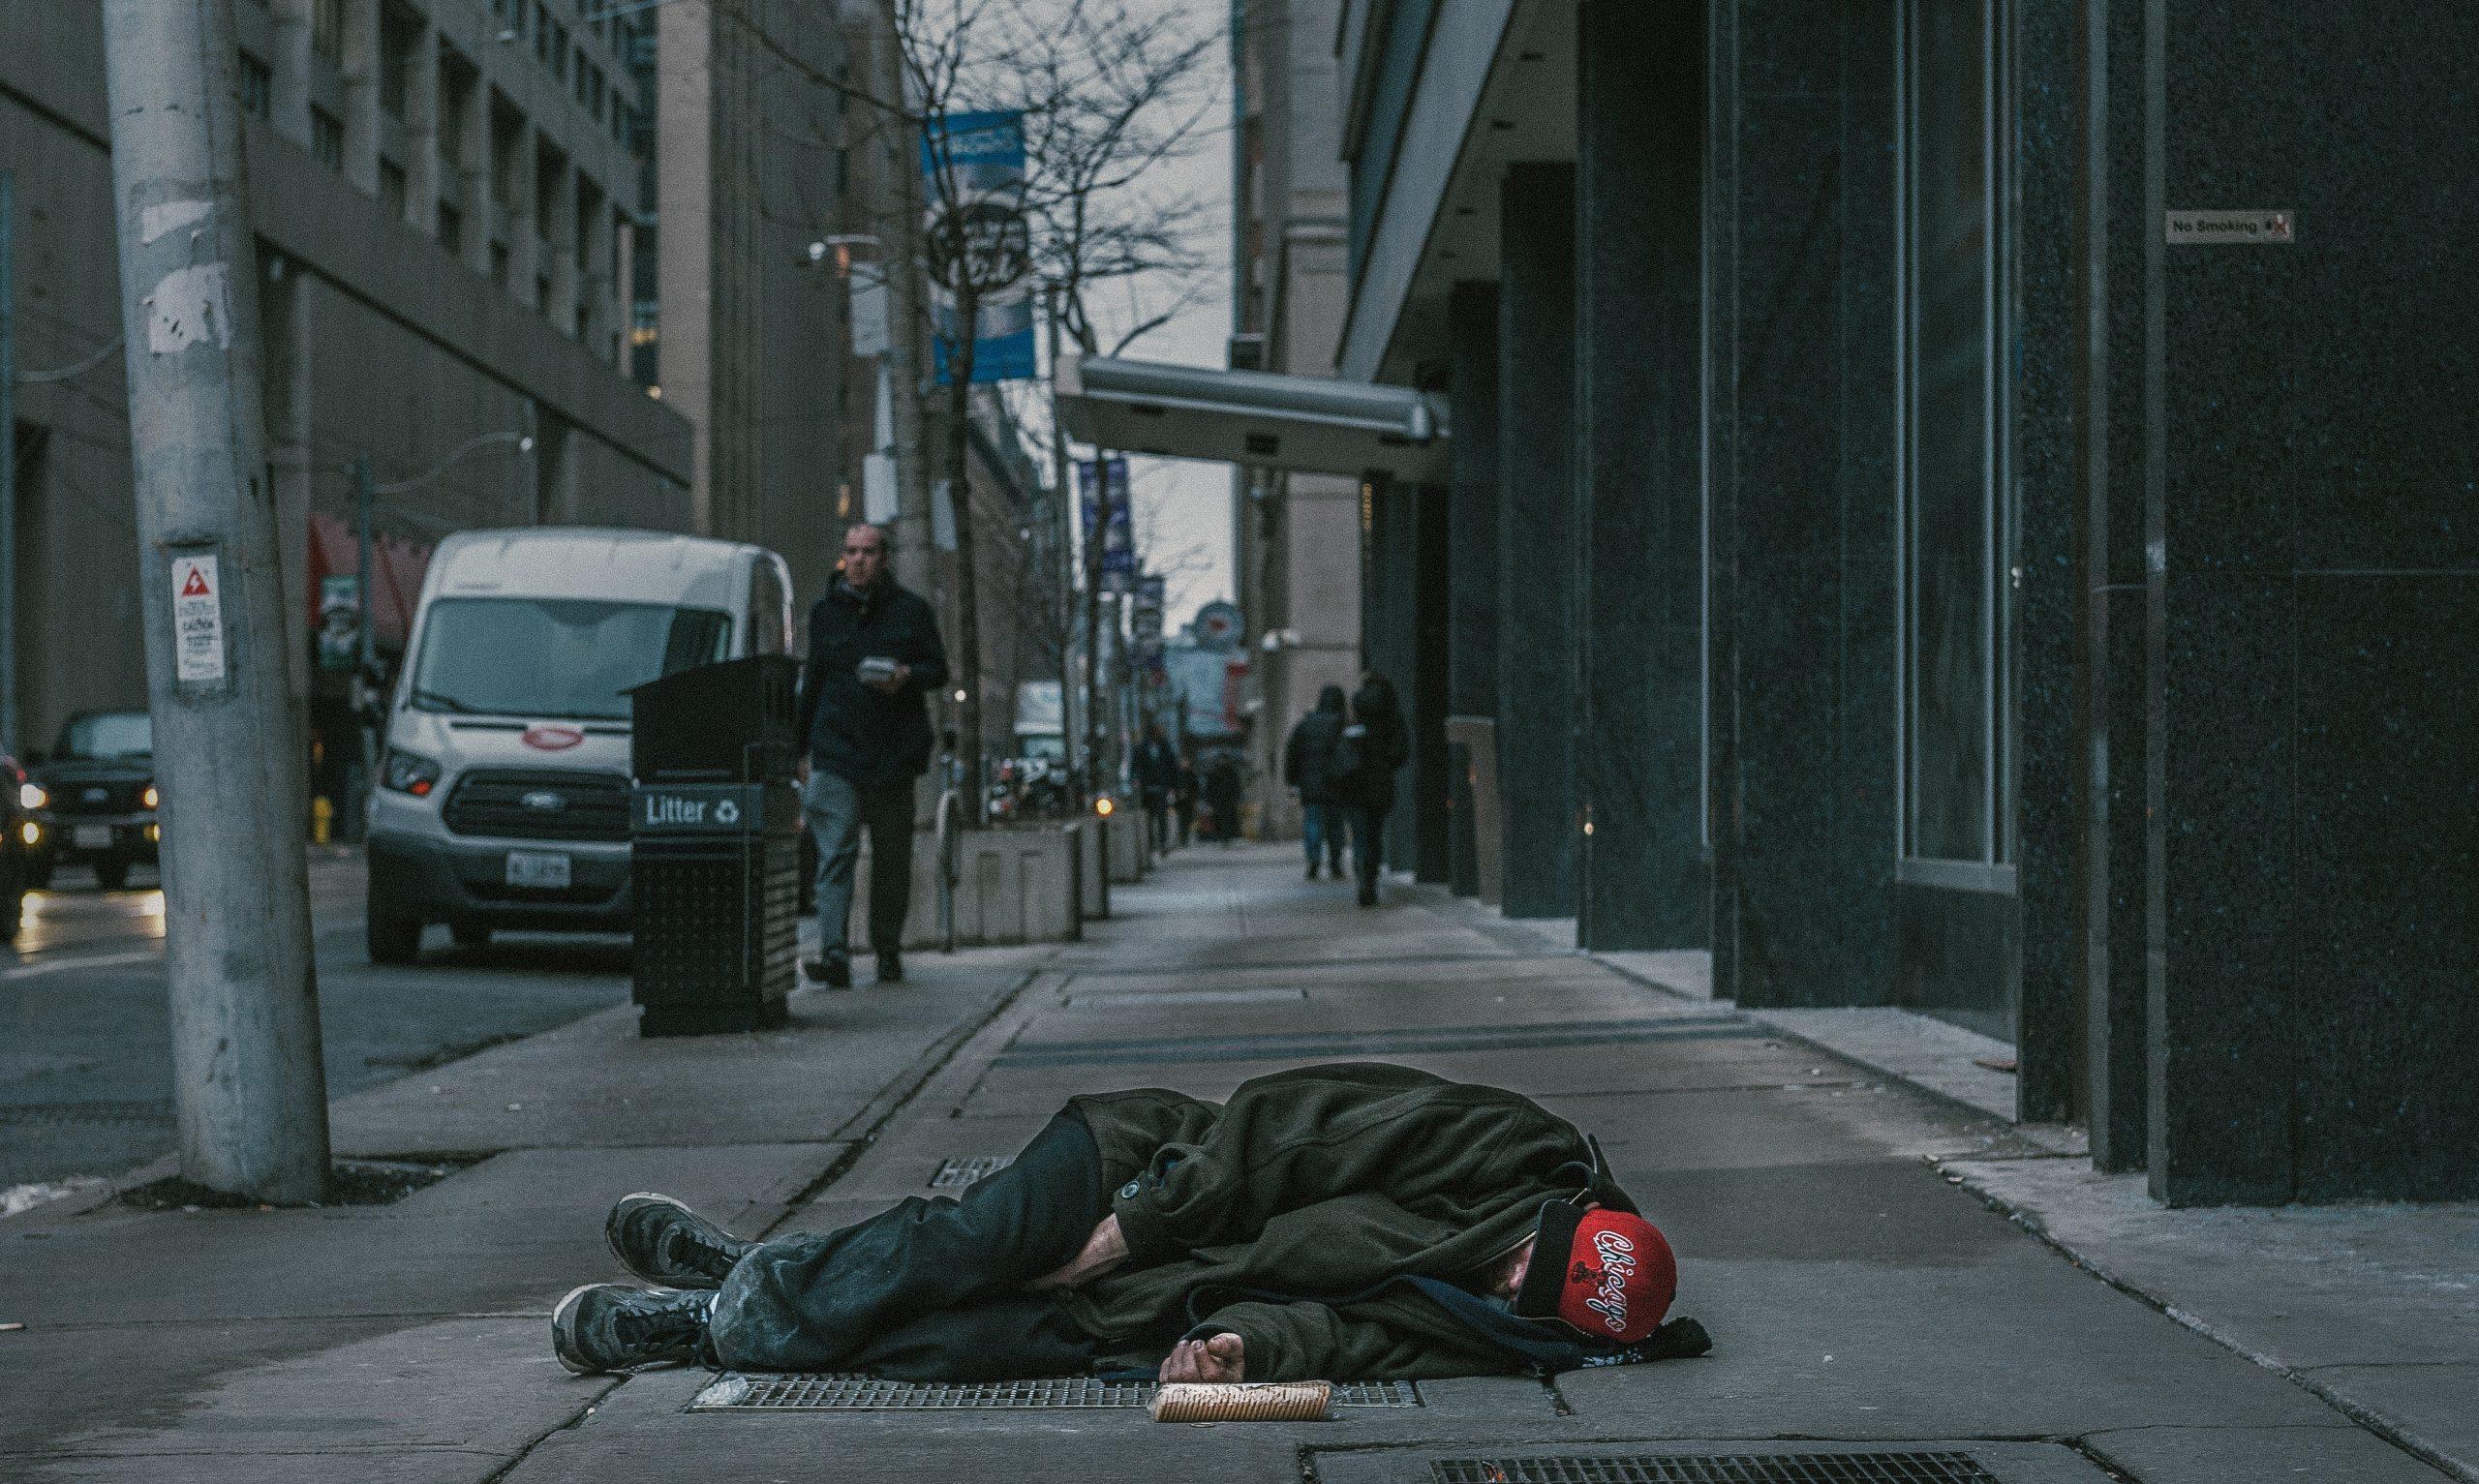 Homeless person sleeping on the sidewalk.